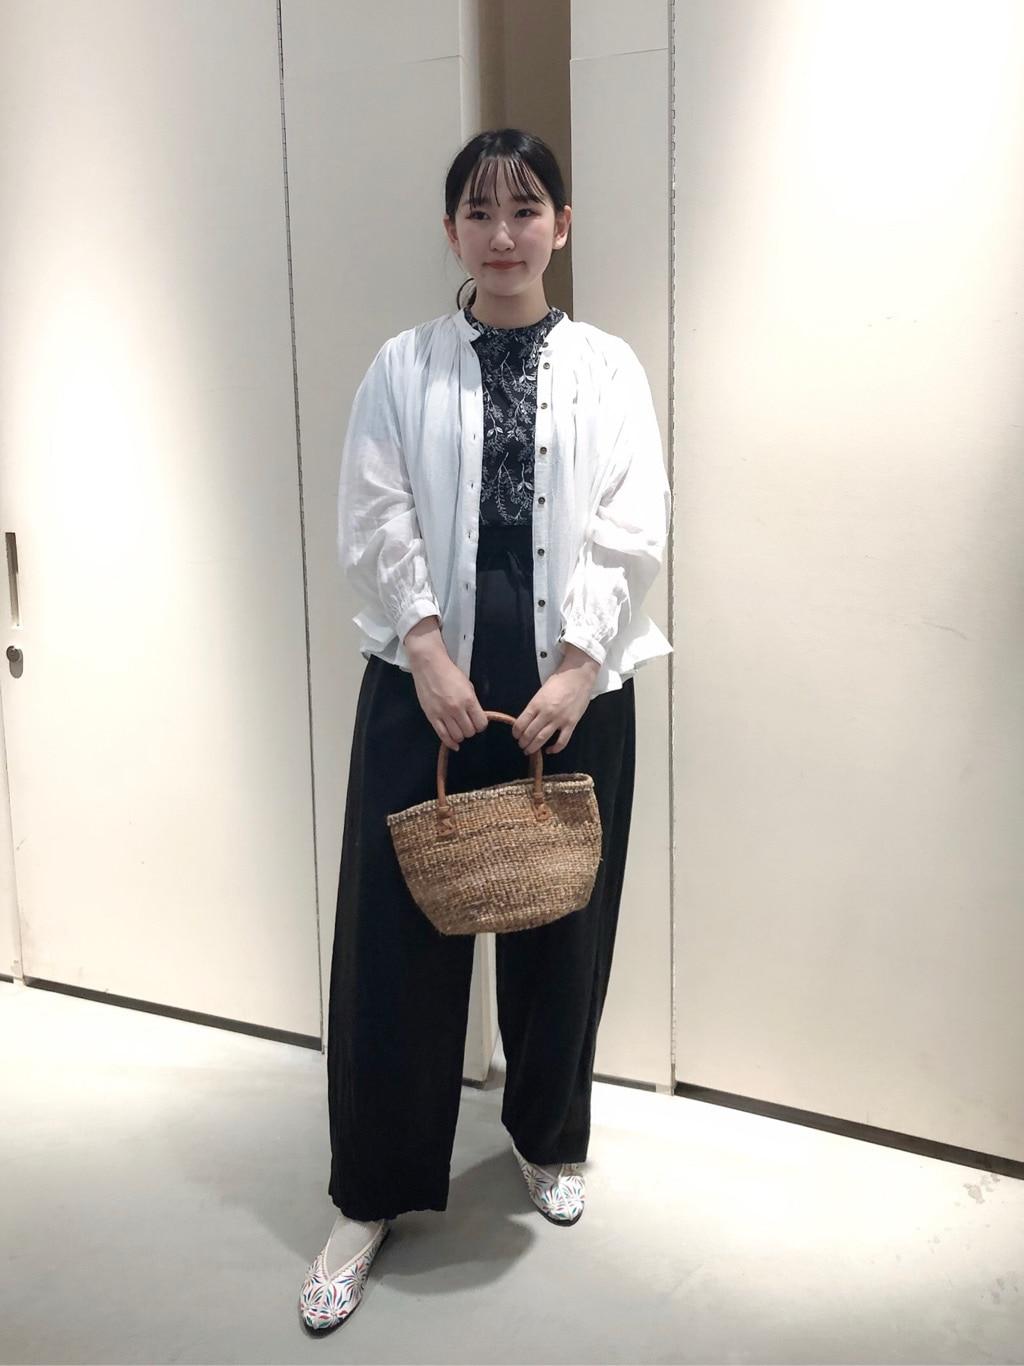 bulle de savon 阪急西宮ガーデンズ 身長:166cm 2020.08.17